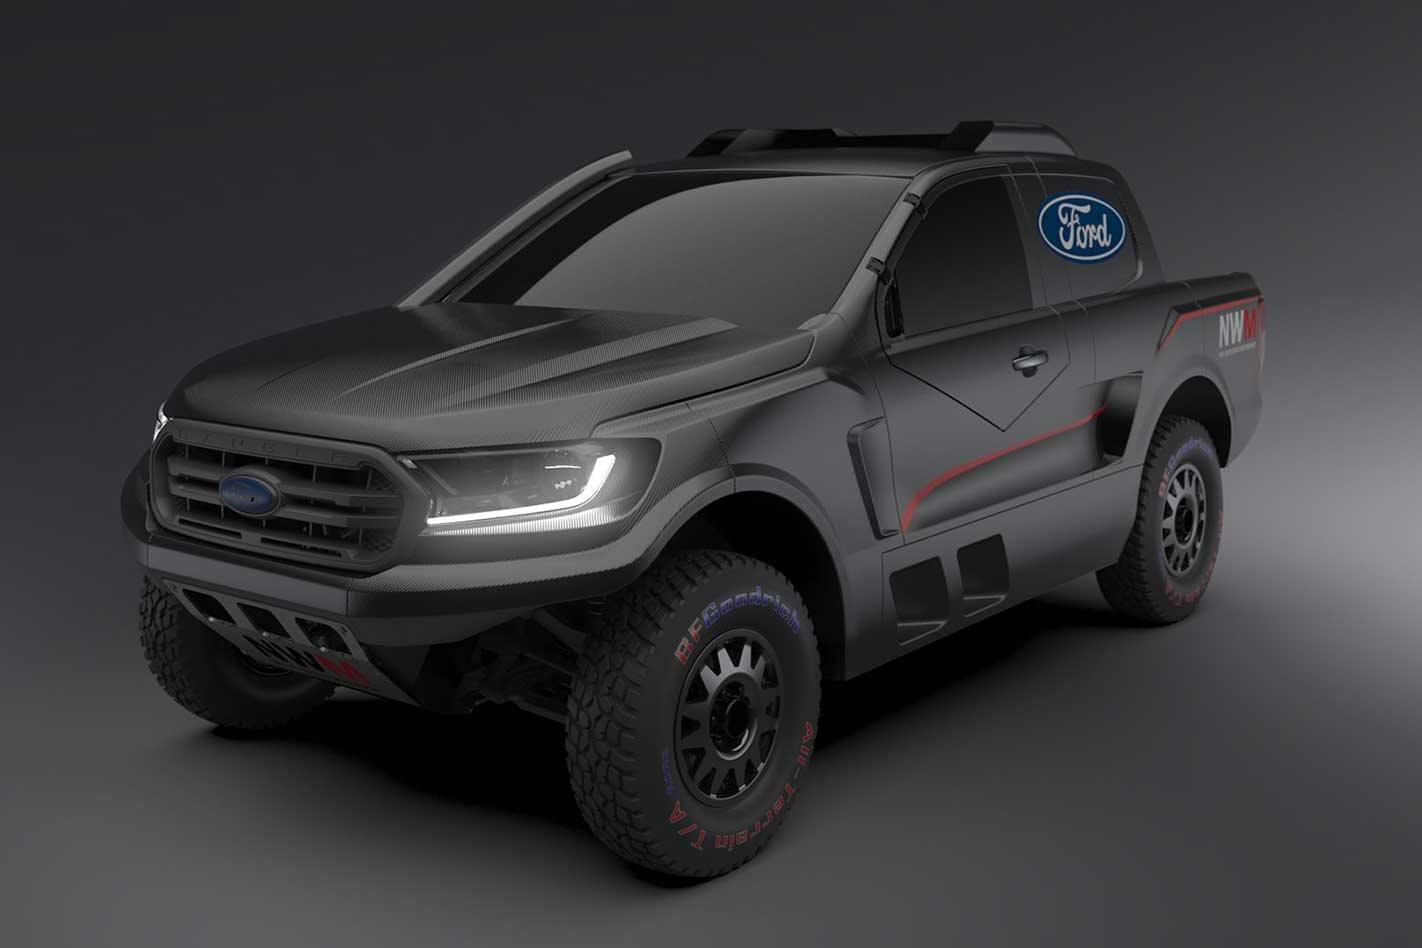 Ford F-150 Raptor-powered Ranger rally raid ute revealed